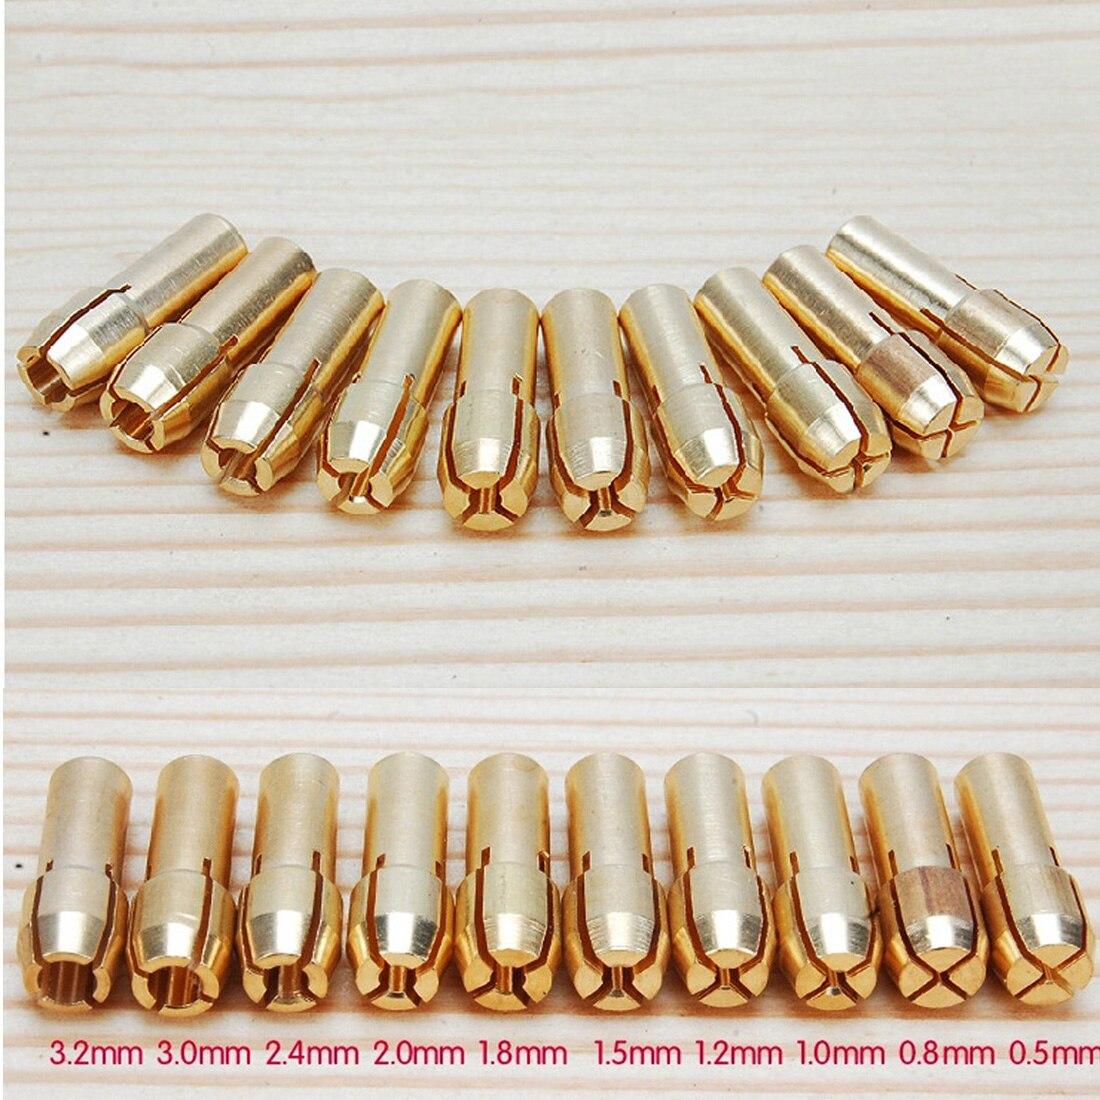 10Pcs /set Brass Drill Chucks Collet Bits 0.5-3.2mm 4.3mm Shank For Dremel Rotary Tool